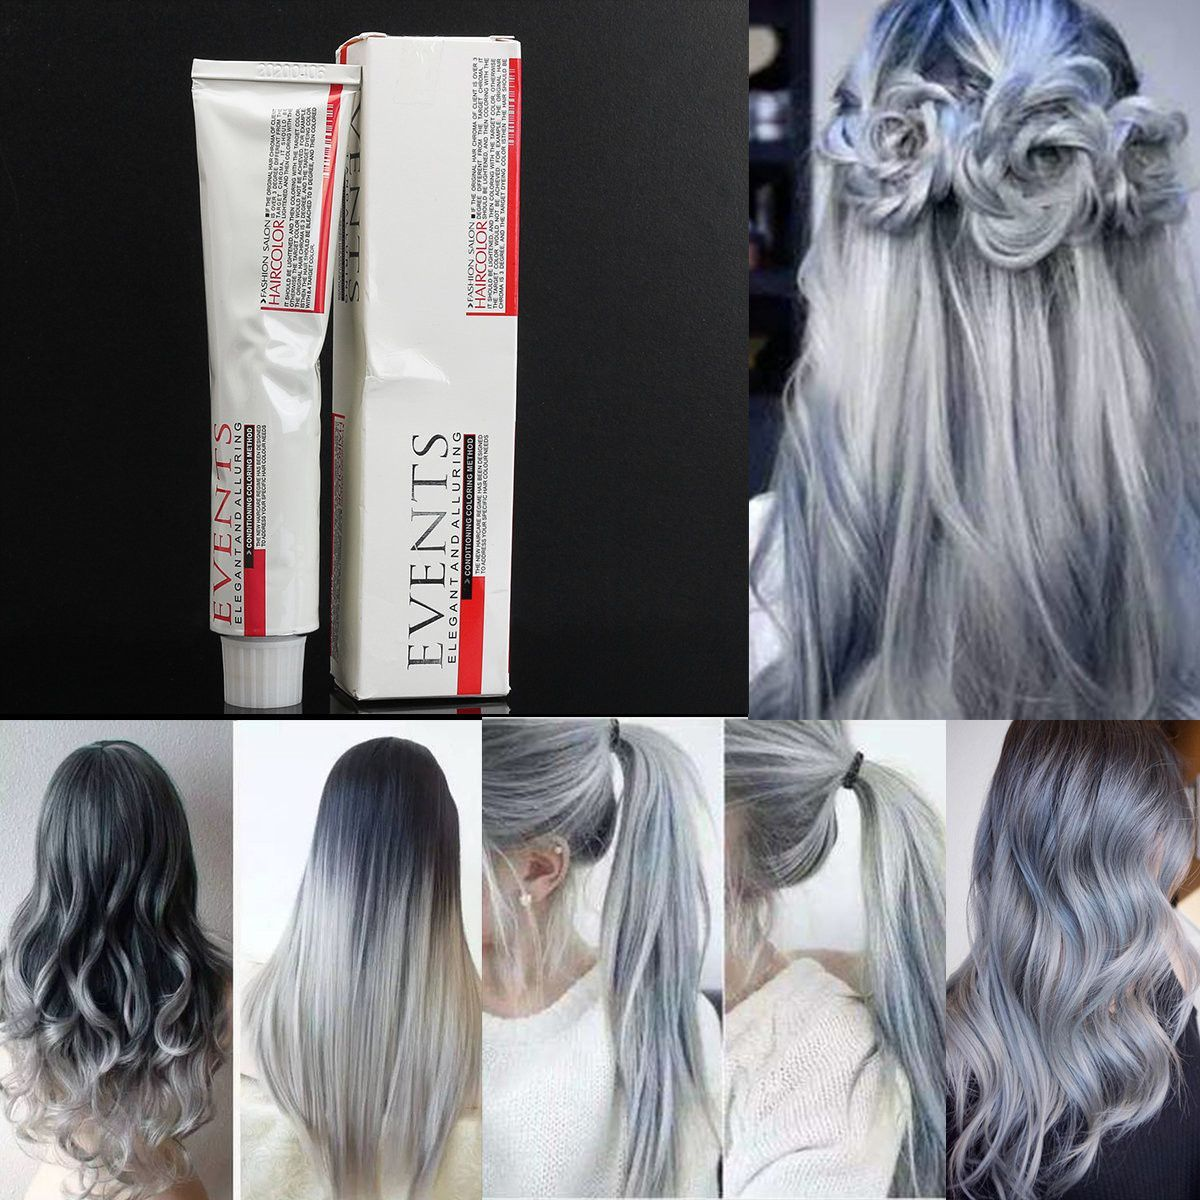 Light Gray Hair Dye Color Cream Fashion Styling Diy For Men Women